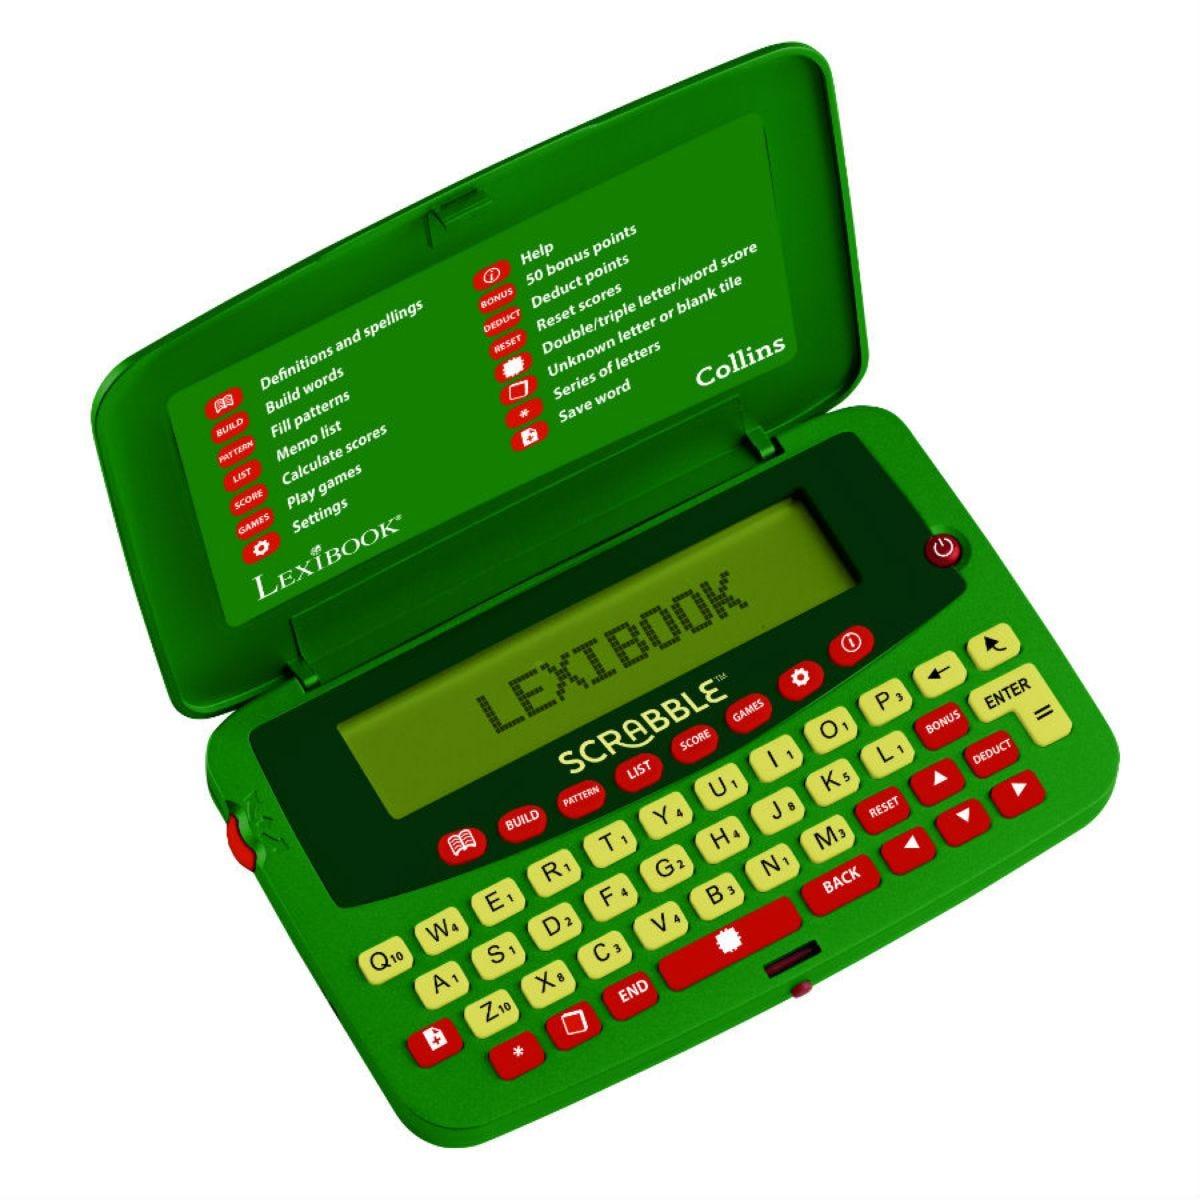 Lexibook Scrabble Dictionary